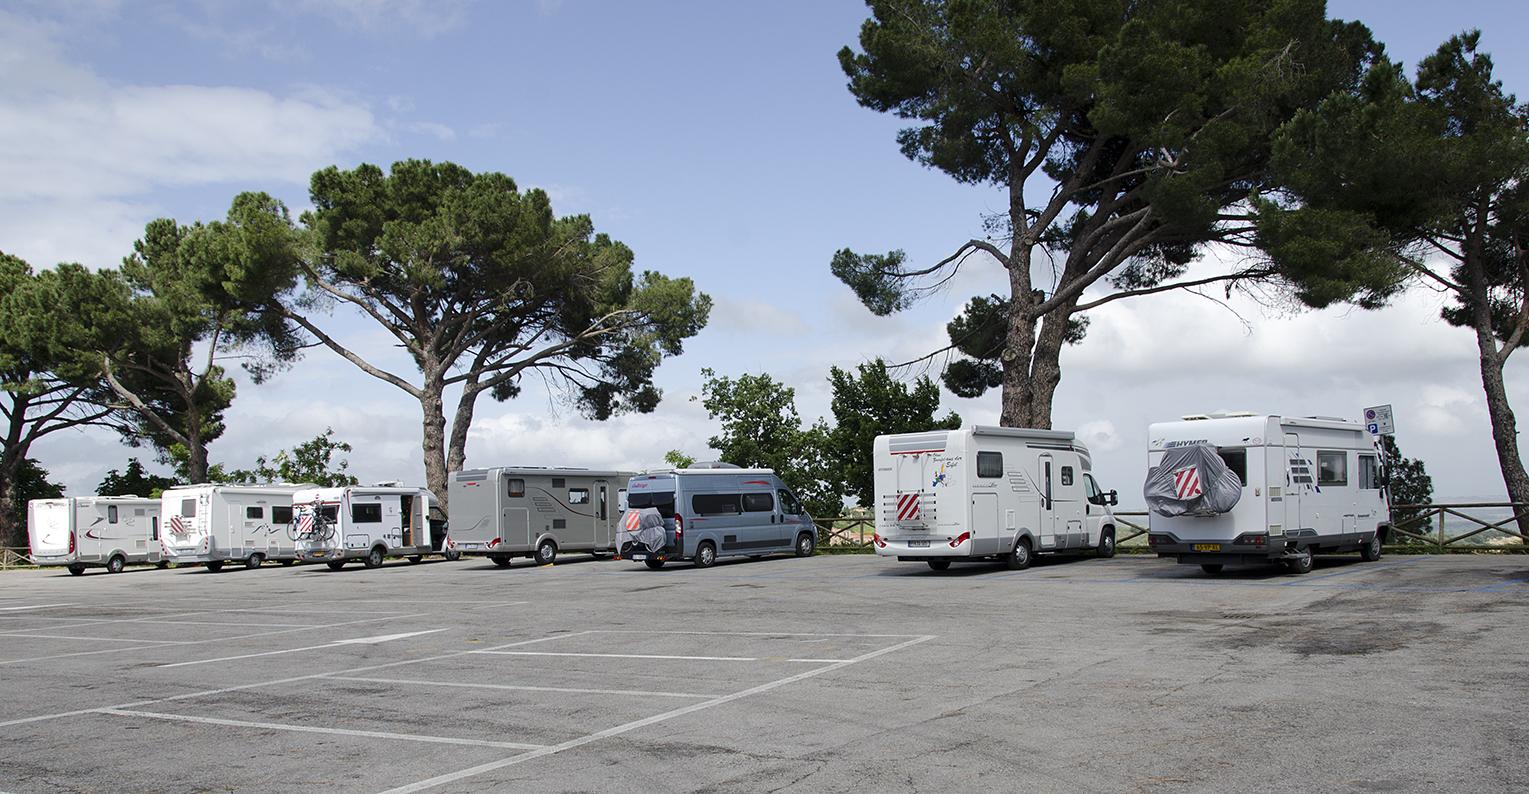 Camperplaats in Montepulciano, Toscane. Italië